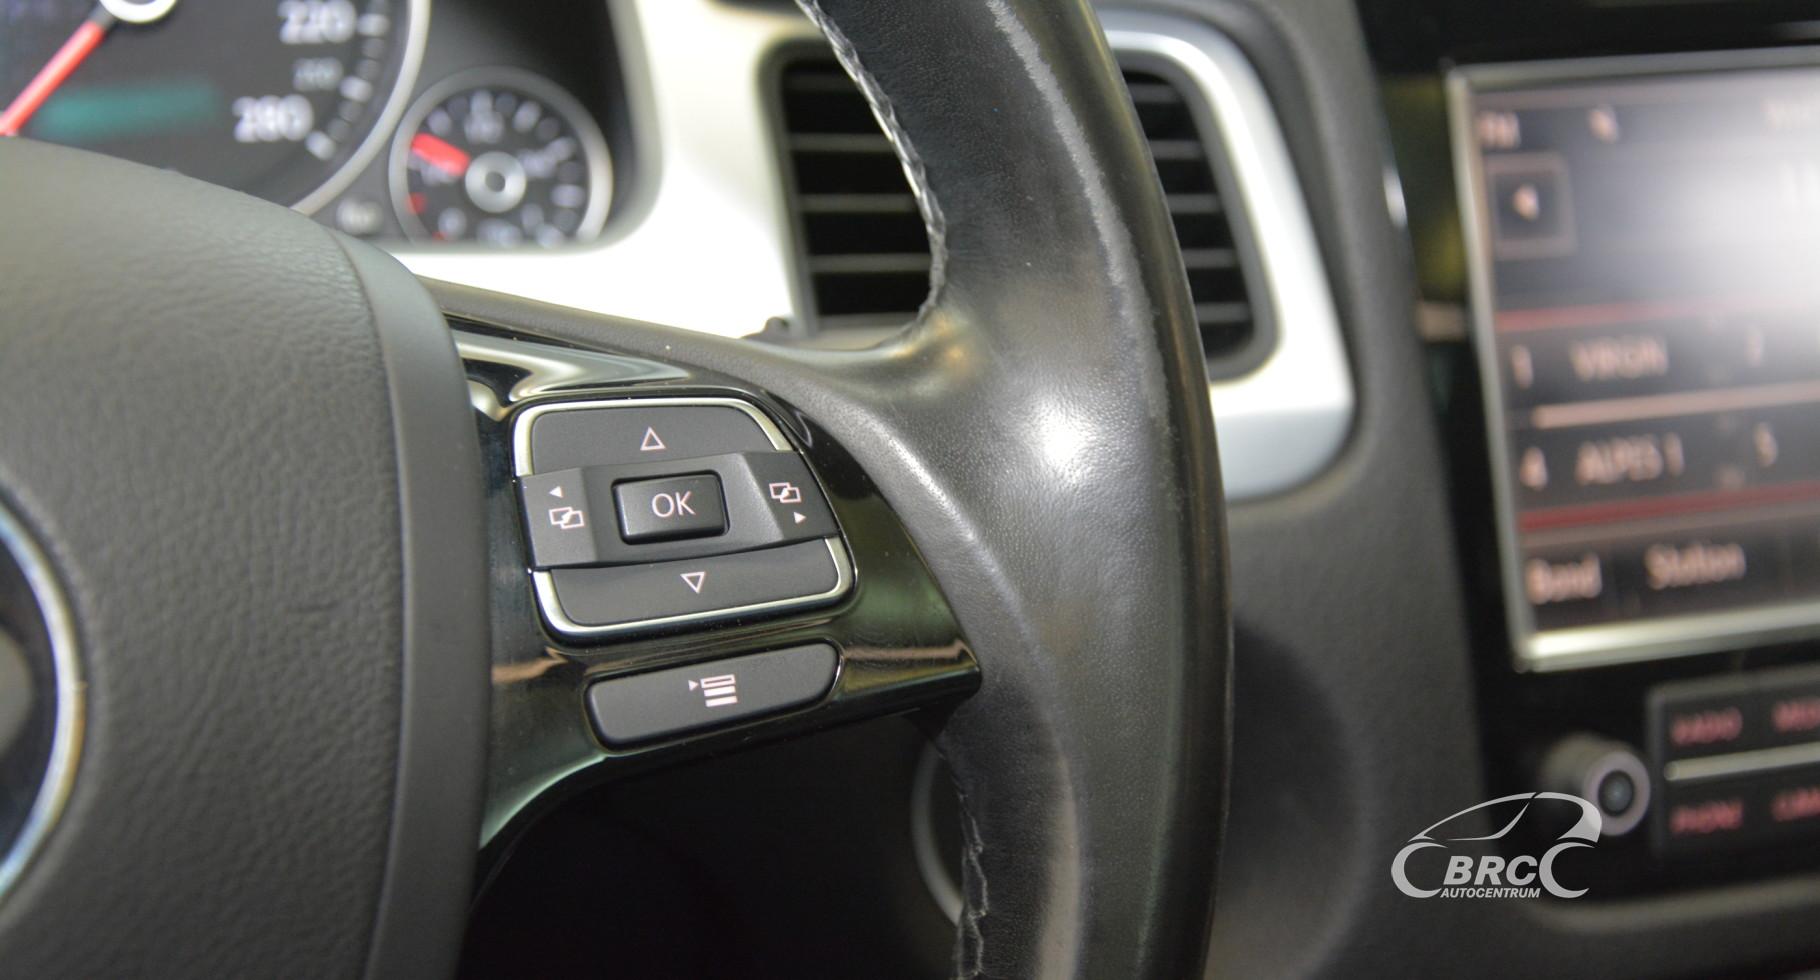 Volkswagen Touareg 3.0TDI V6 4MOTION Automatas